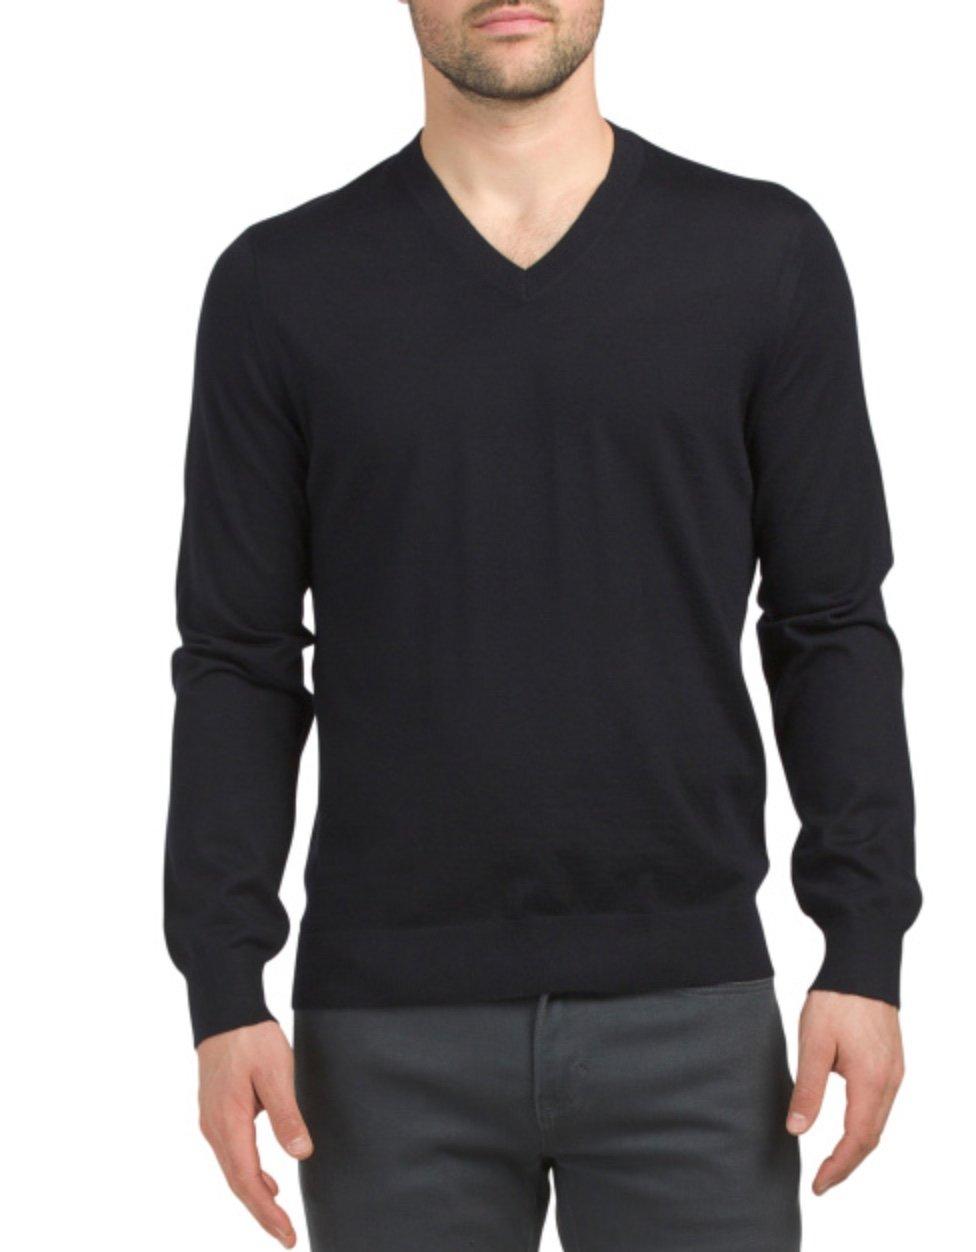 Men's Cashmere Sweater, TJMaxx